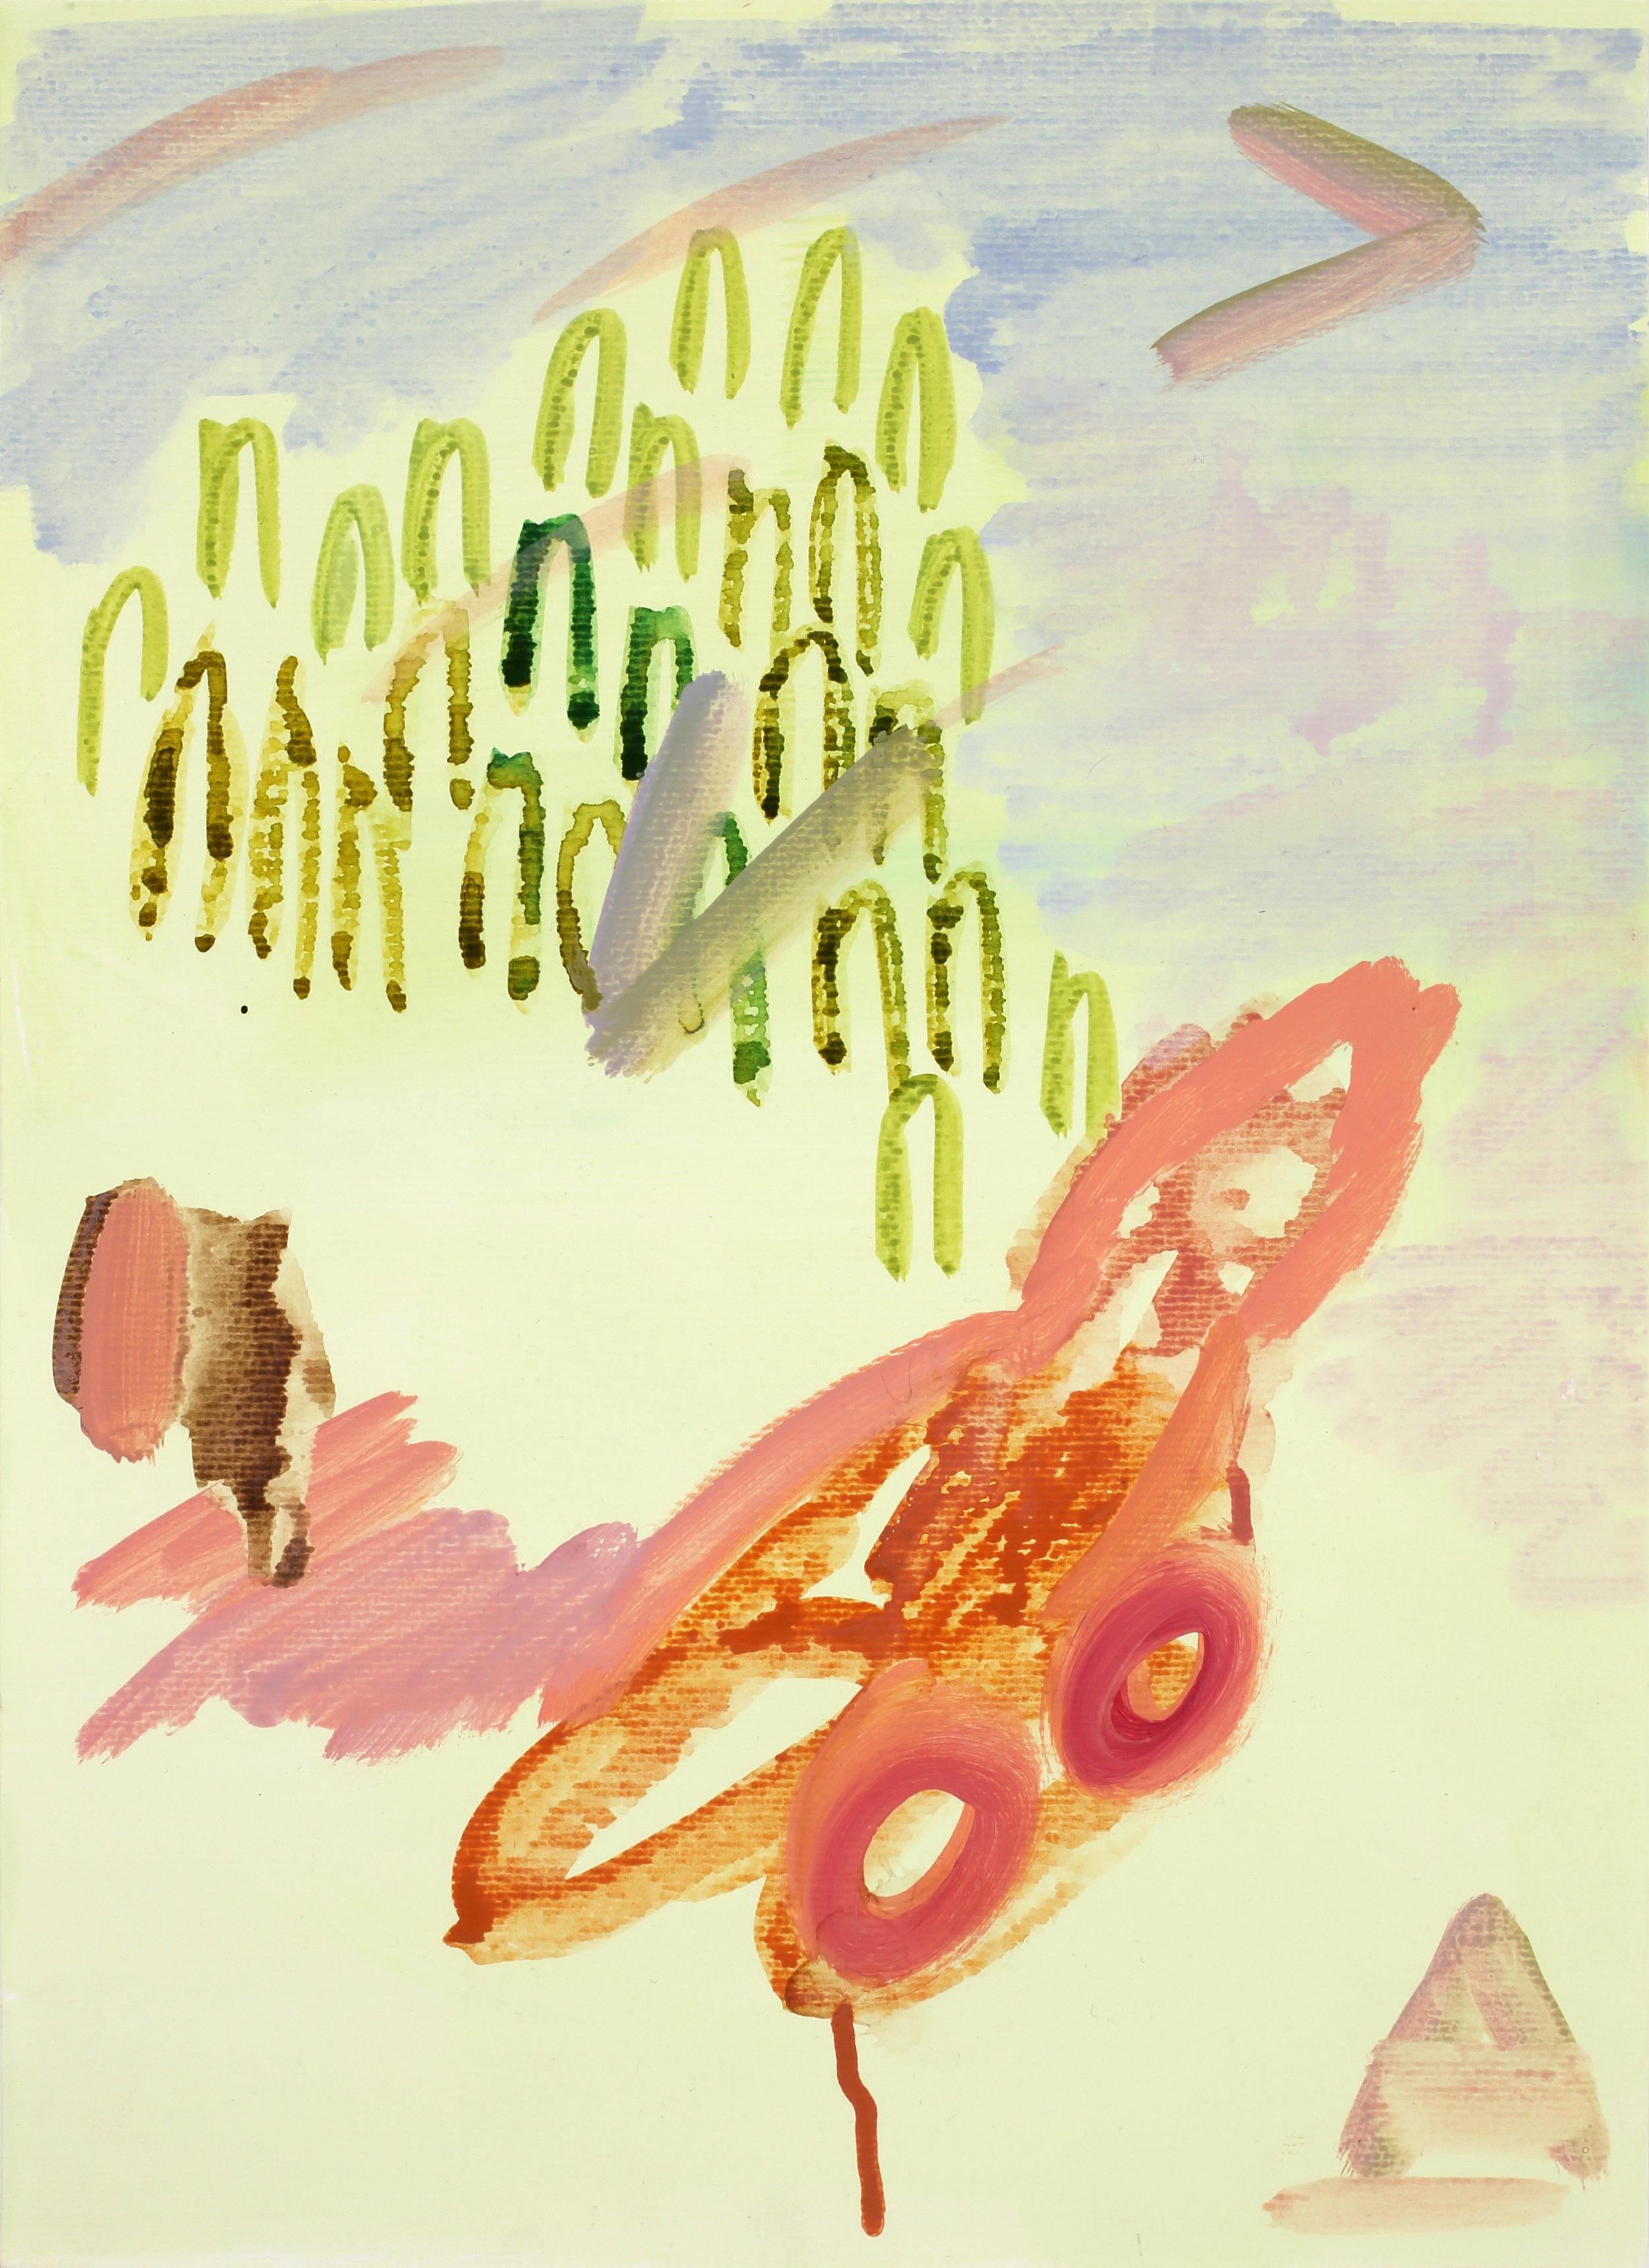 Haedam River (V/P #125)    2019, Watercolour on paper, 40.7x29.7cm